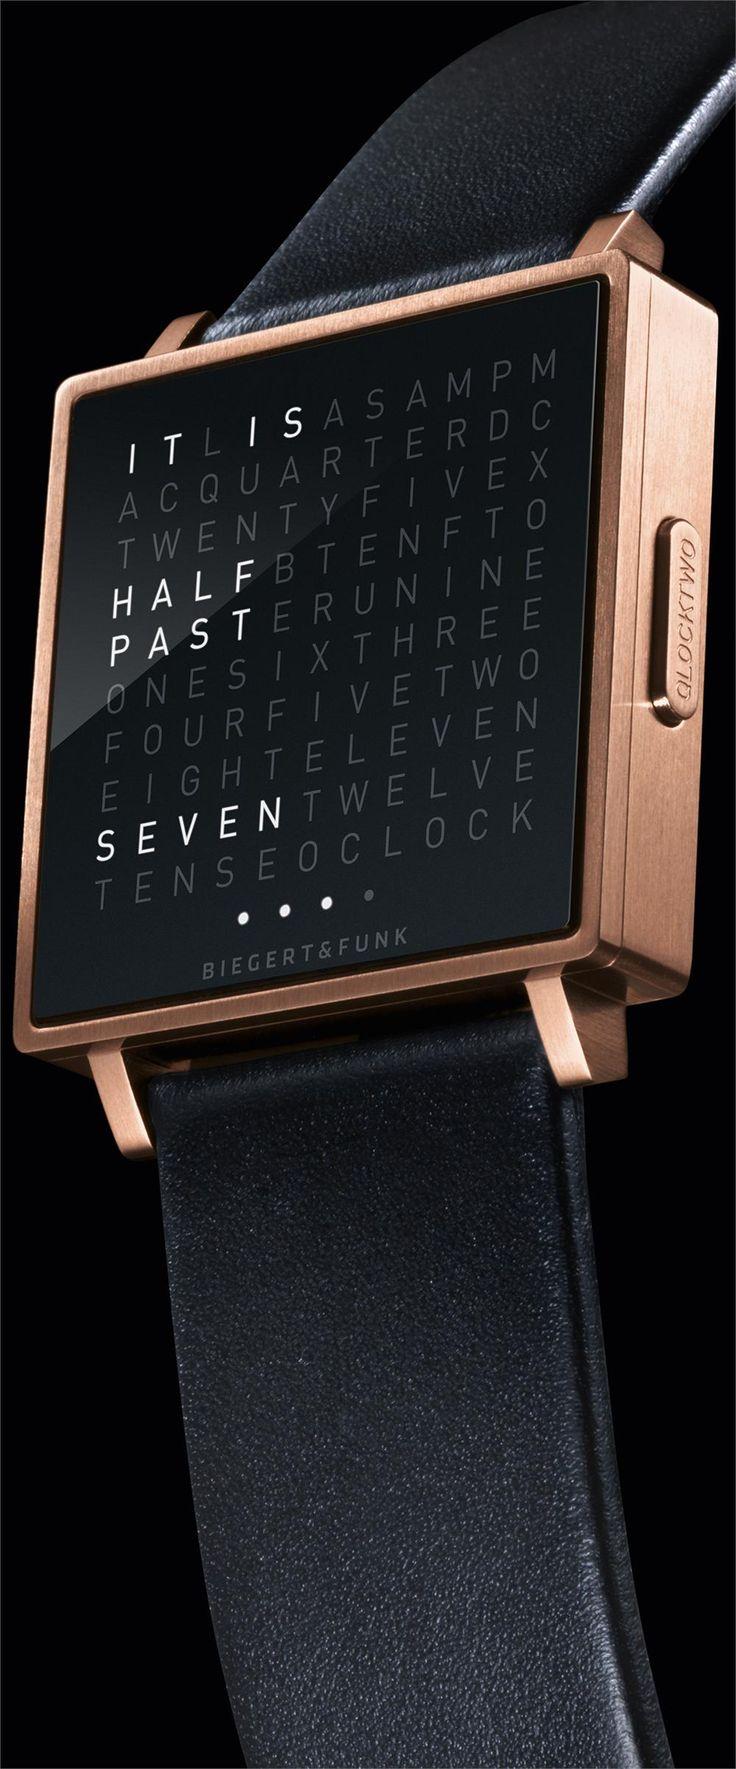 "Biegert & Funk ""QLOCKTWO W"" wristwatch, by Andreas Funk, 35x35mm."